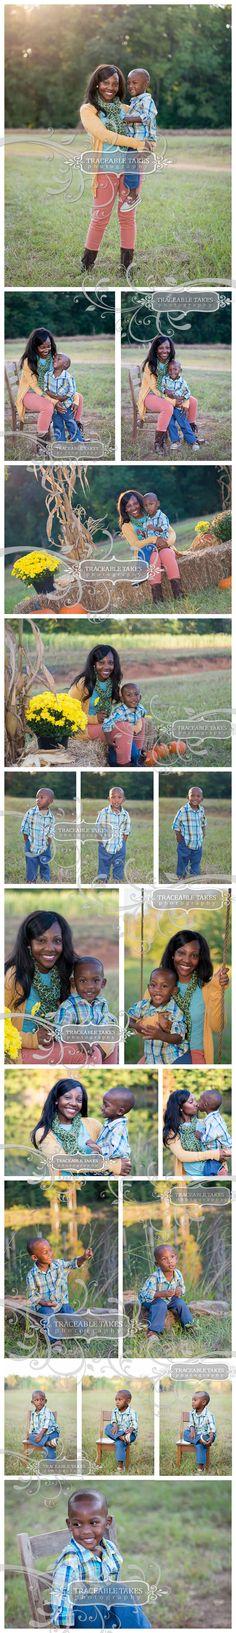 photo shoot, fall photo